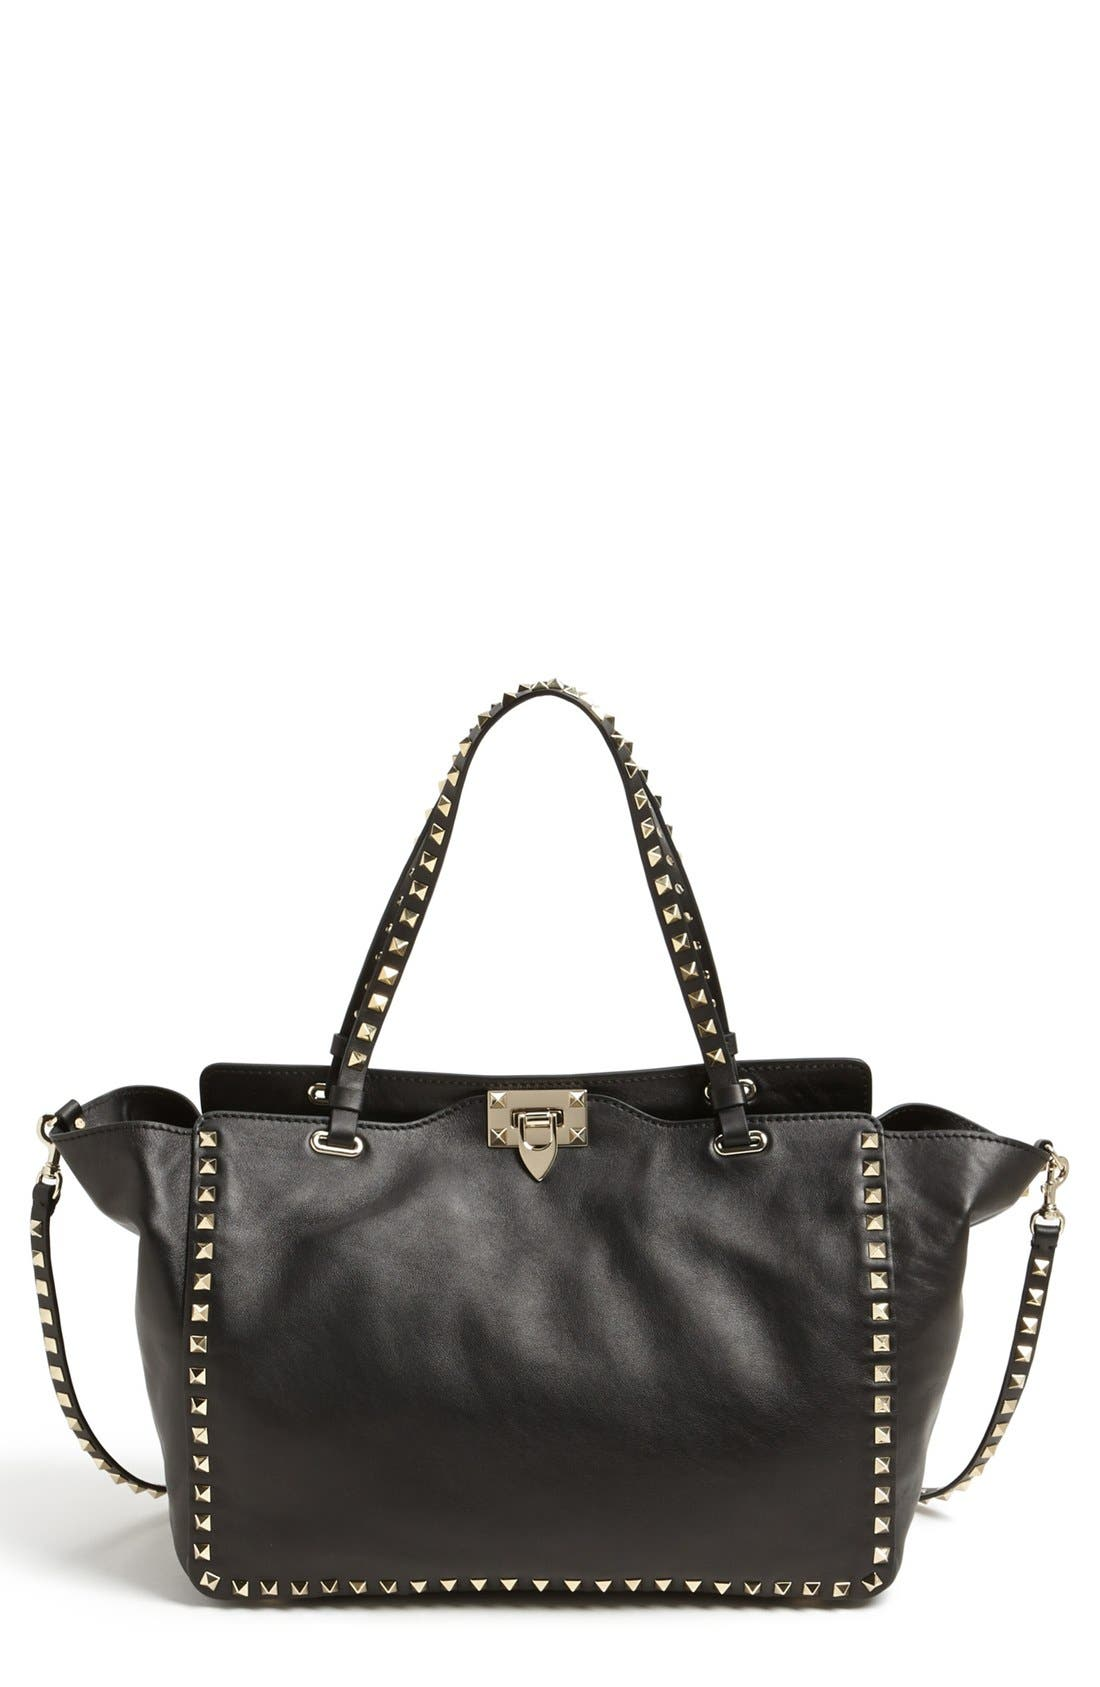 Alternate Image 1 Selected - Valentino 'Medium Rockstud' Double Handle Leather Tote